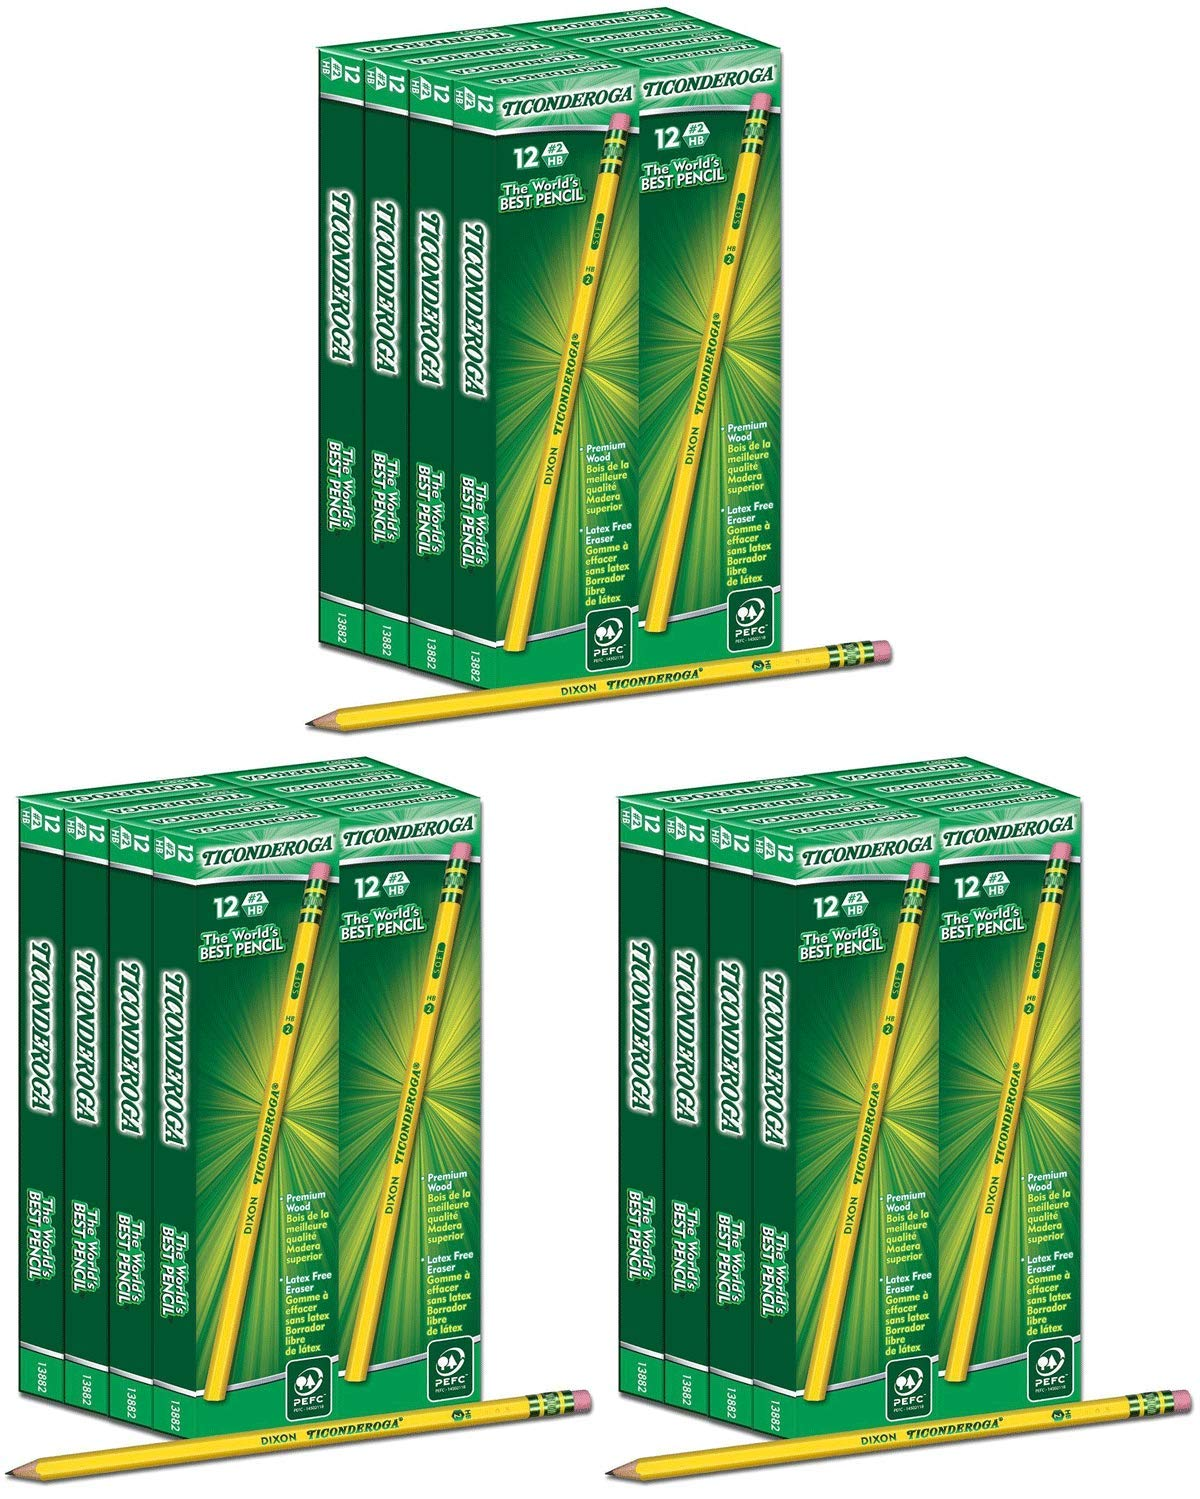 NCVBHDGH Ticonderoga Wood-Cased 2 HB Pencils, Box of 96, Yellow 3 Pack